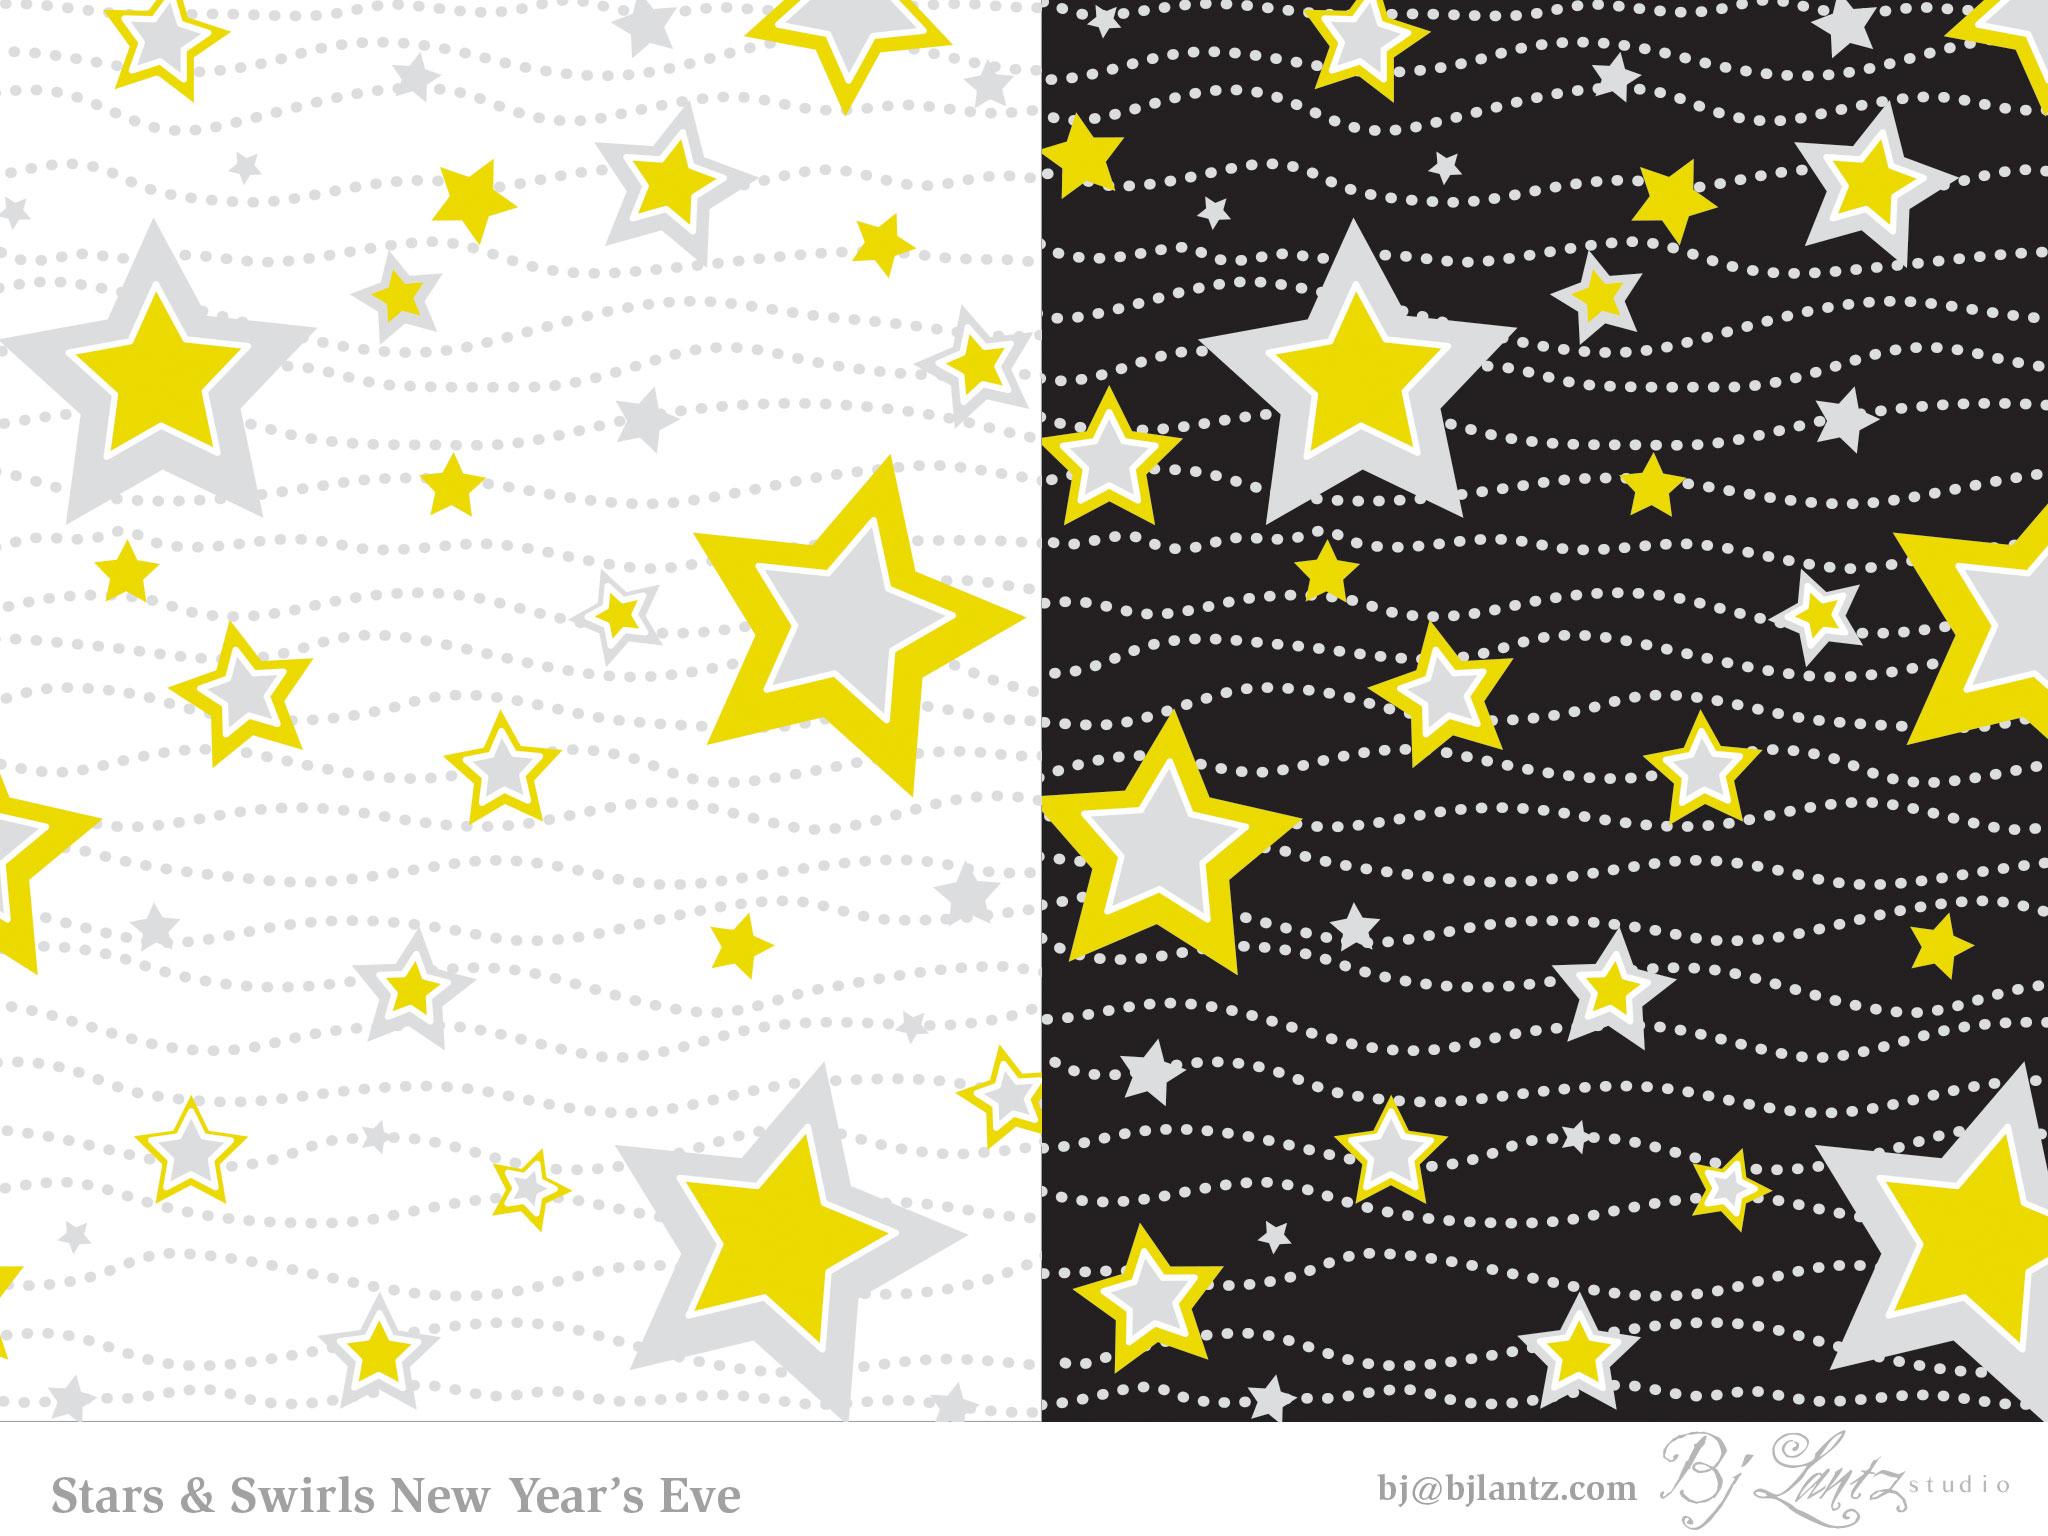 Stars-Swirls-BJ-Lantz_3.jpg